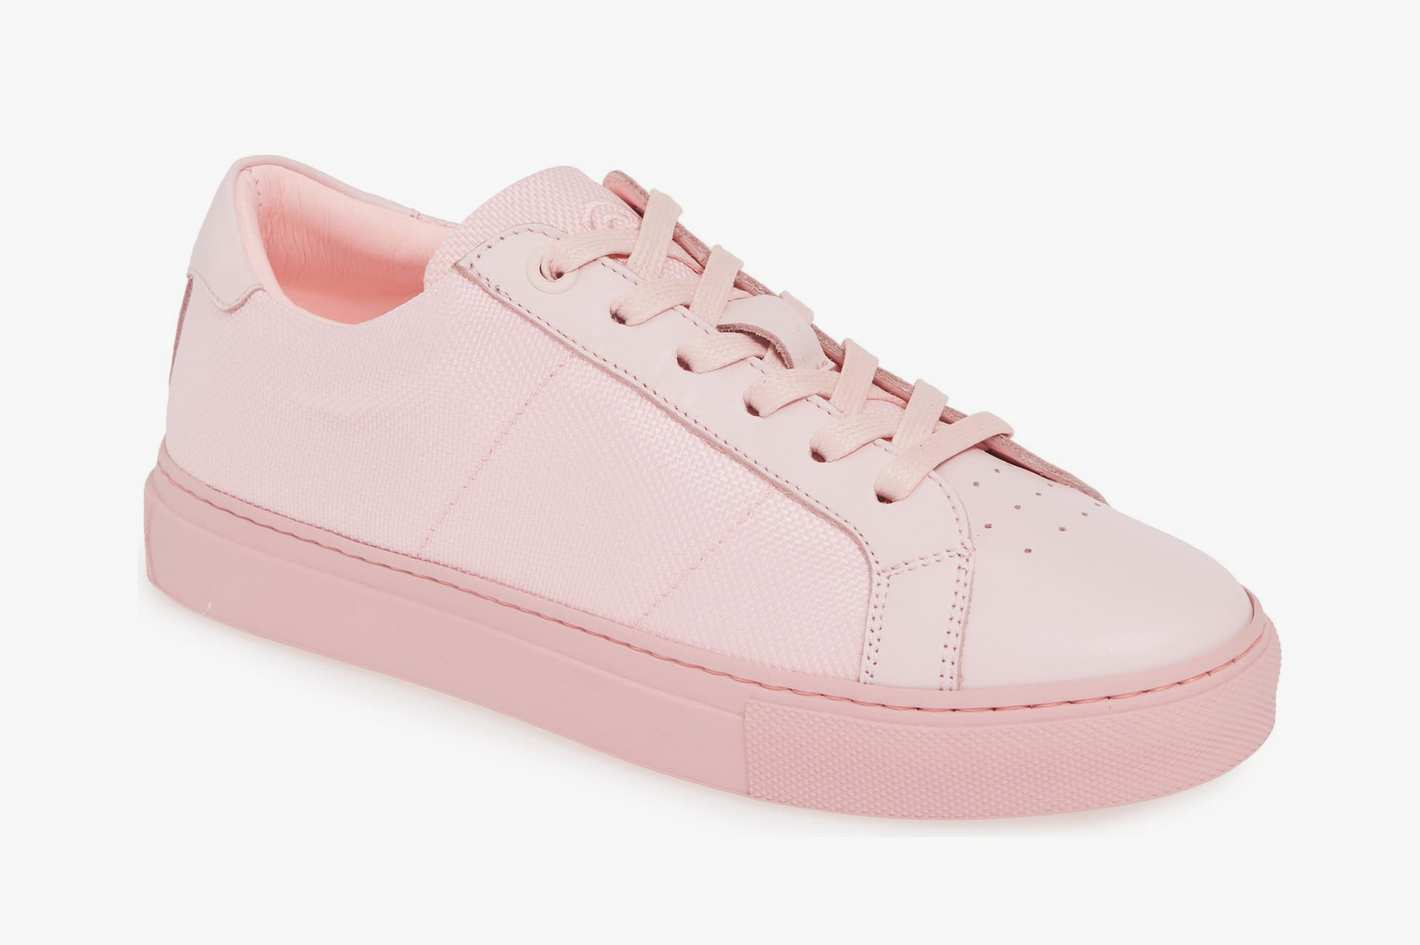 Greats Royale Low-Top Sneaker